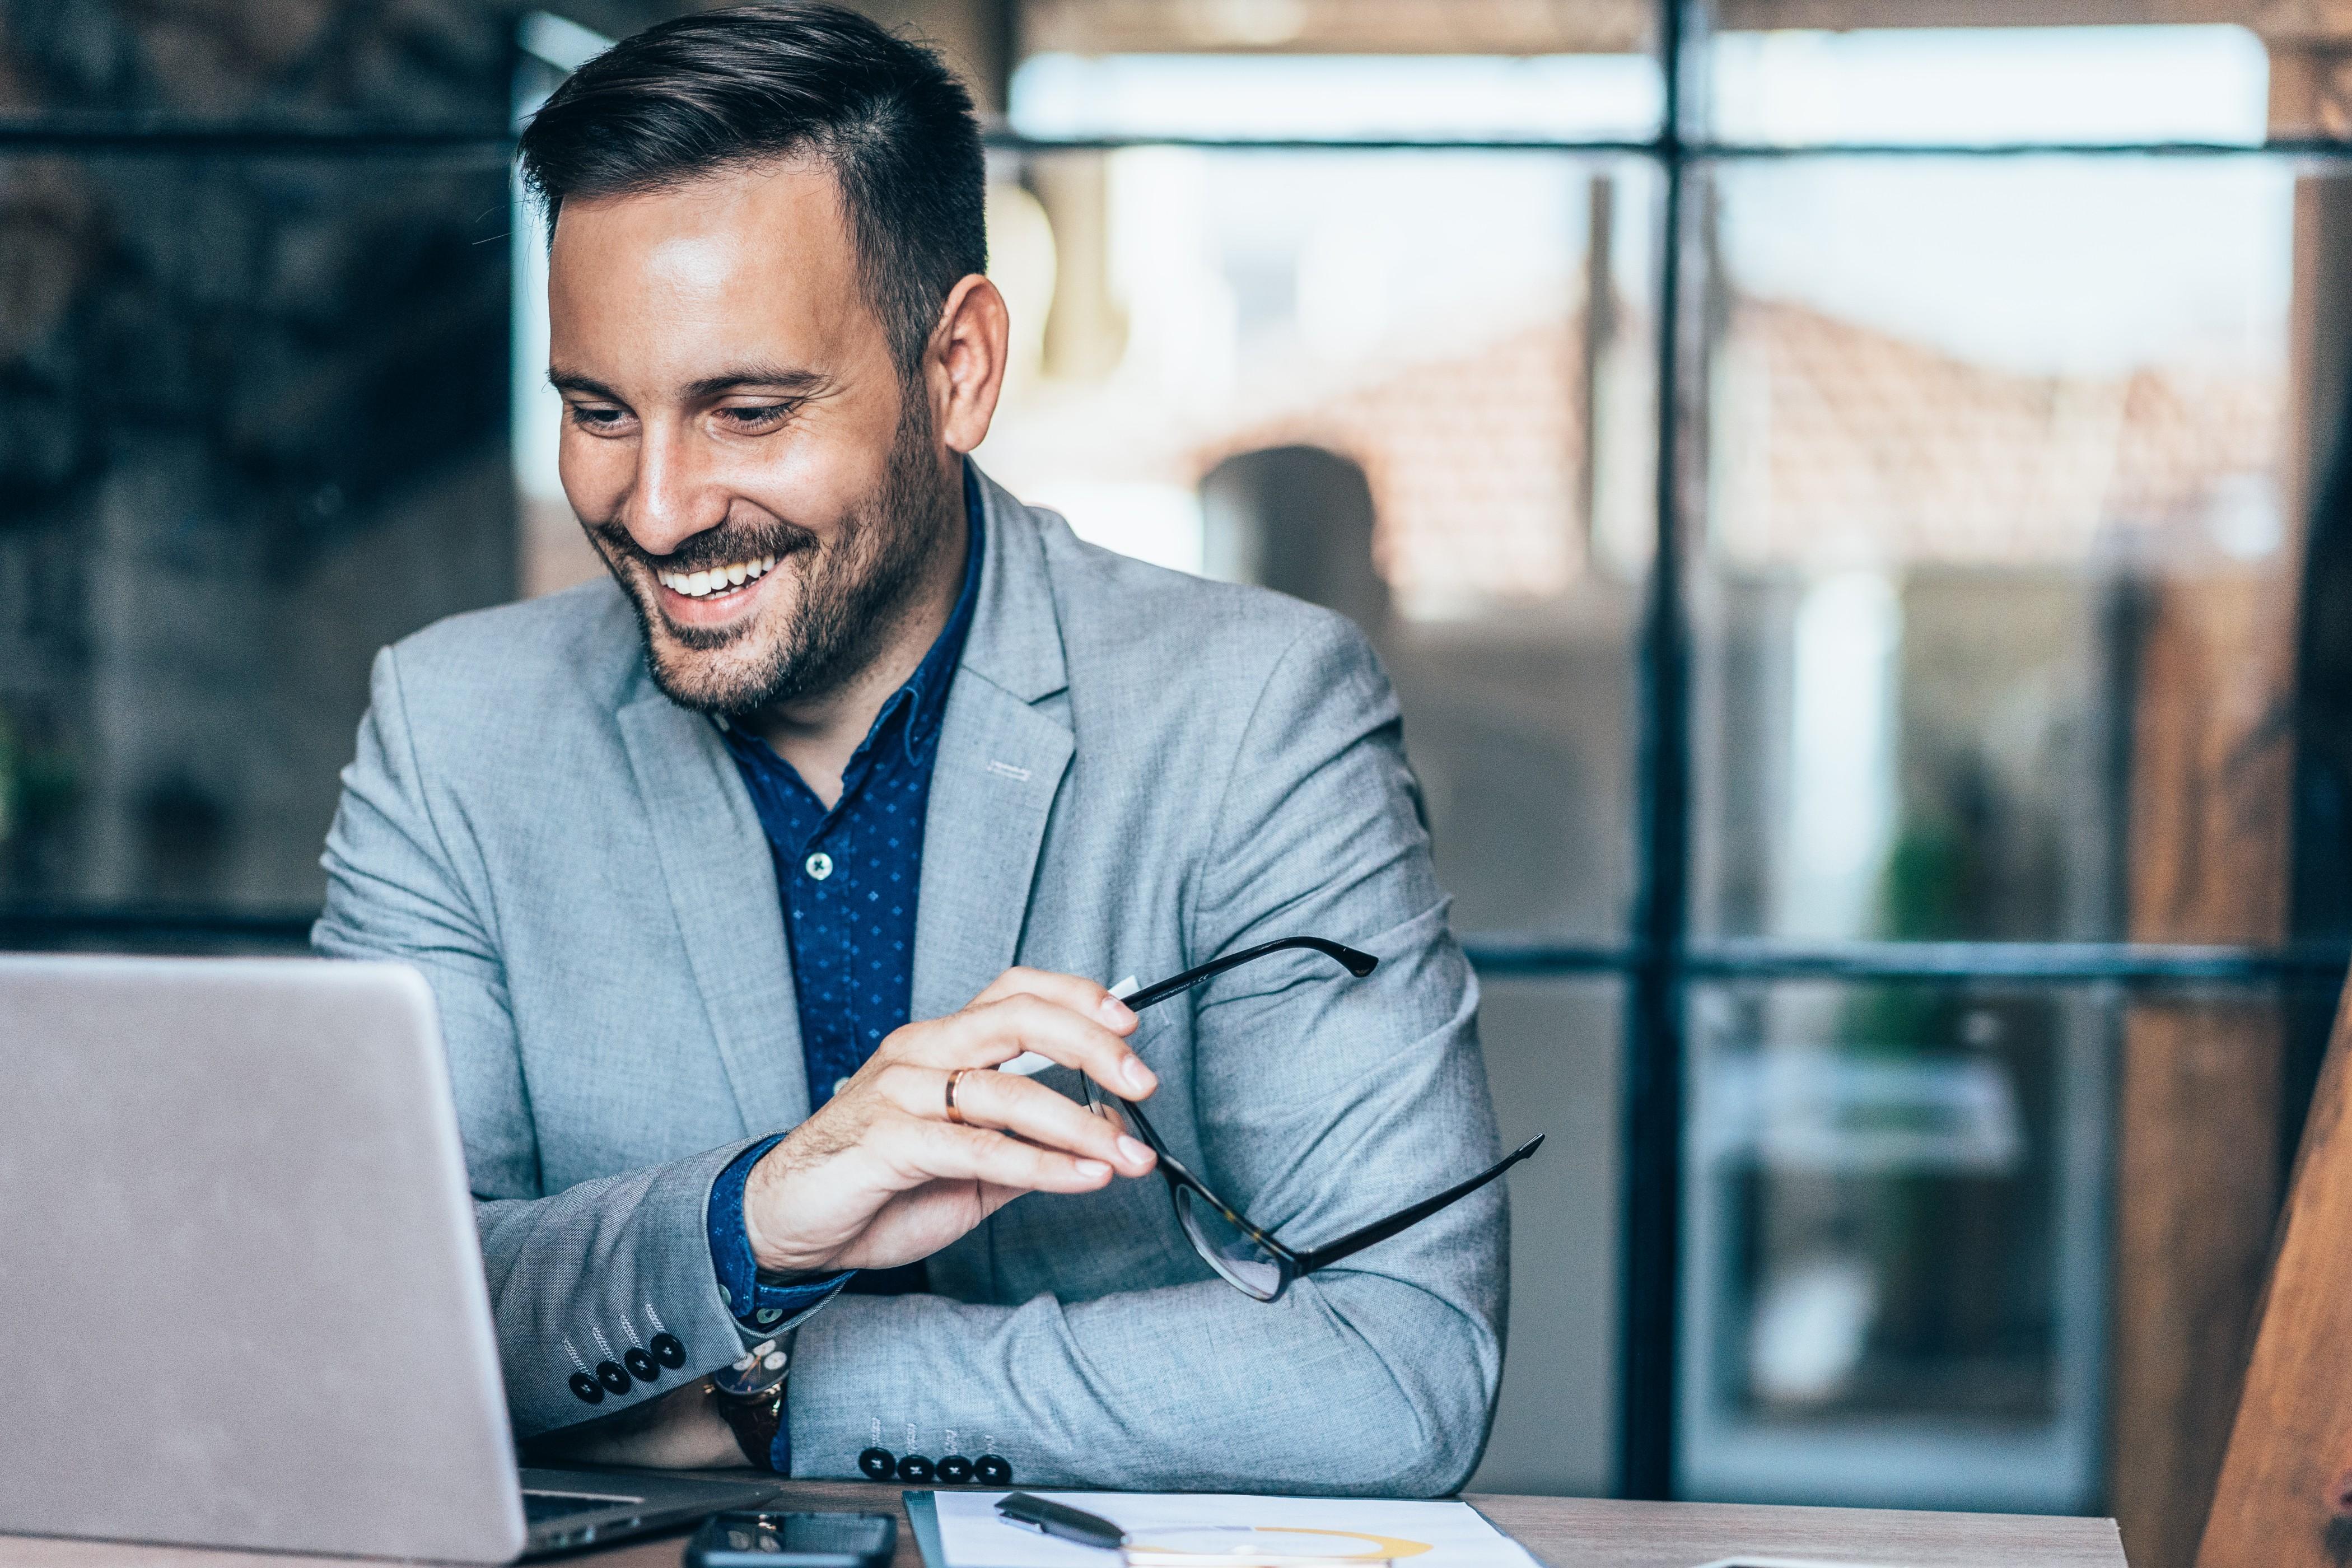 Man-in-suit-smiling-at-laptop-computer